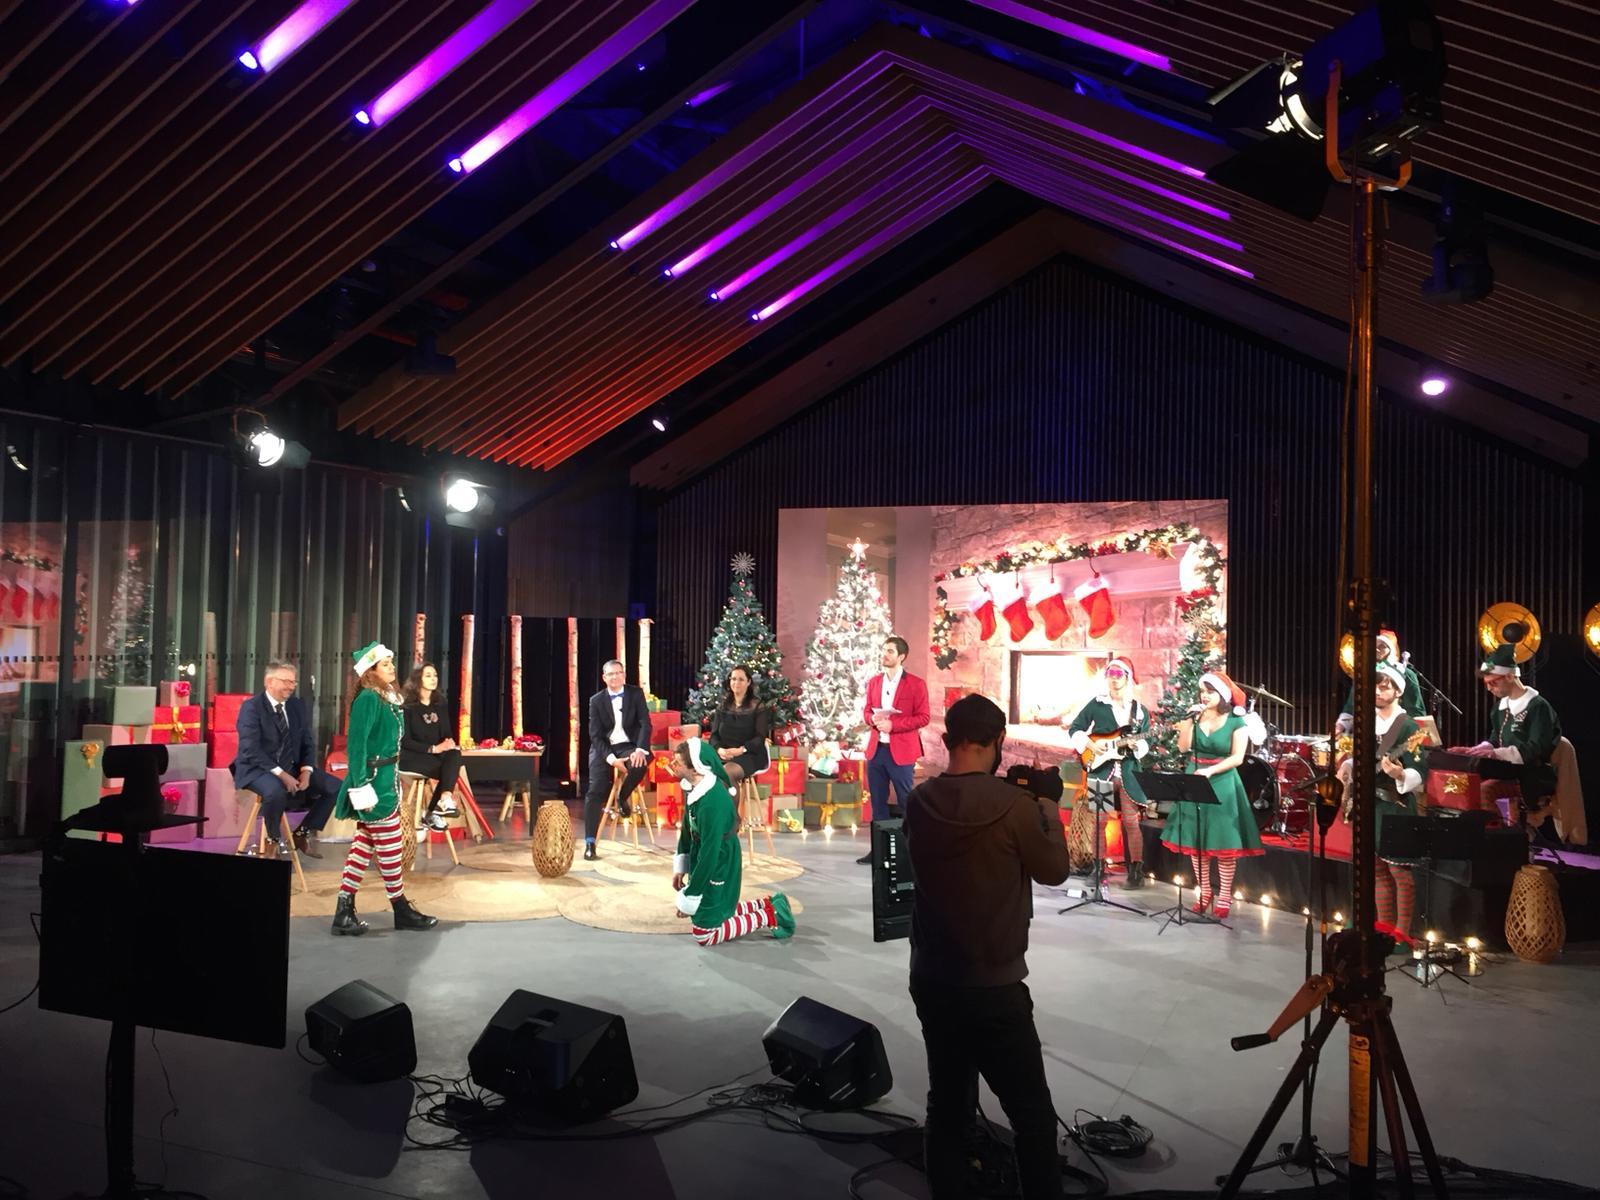 Evènement digital de Noël